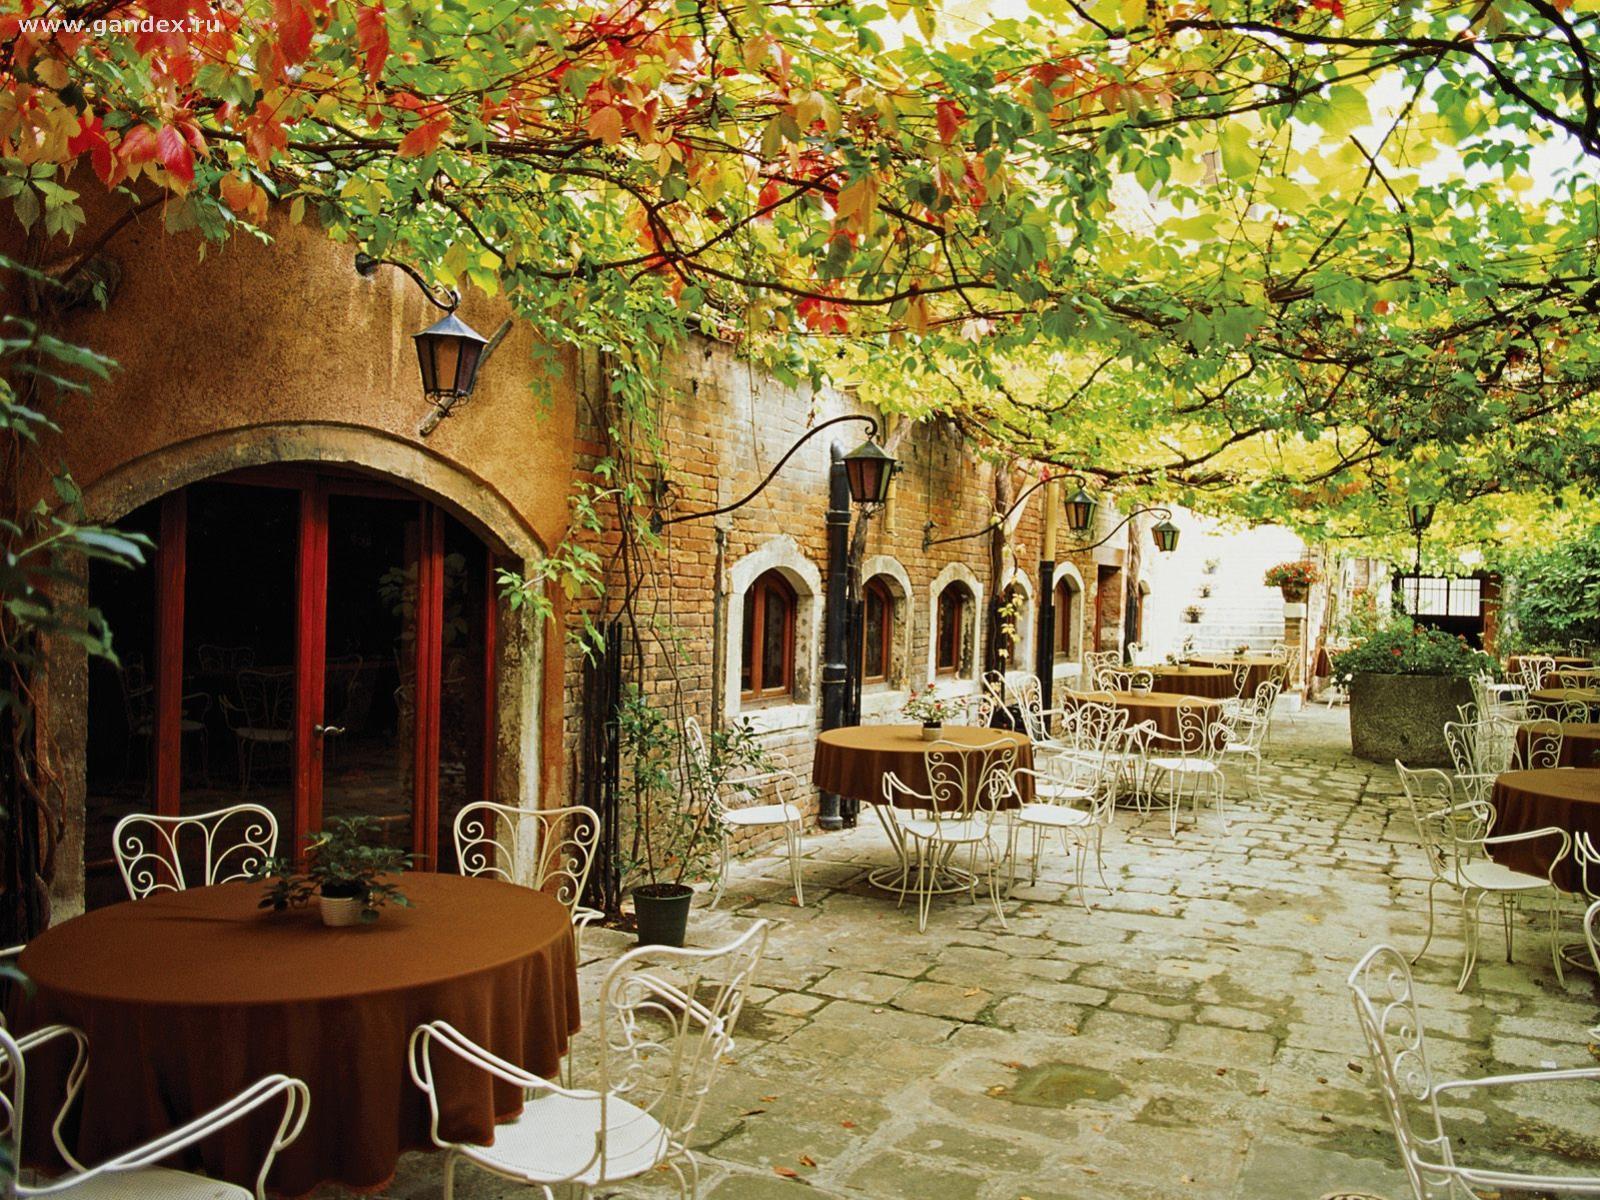 Italian Restaurant Wallpapers Top Free Italian Restaurant Backgrounds Wallpaperaccess